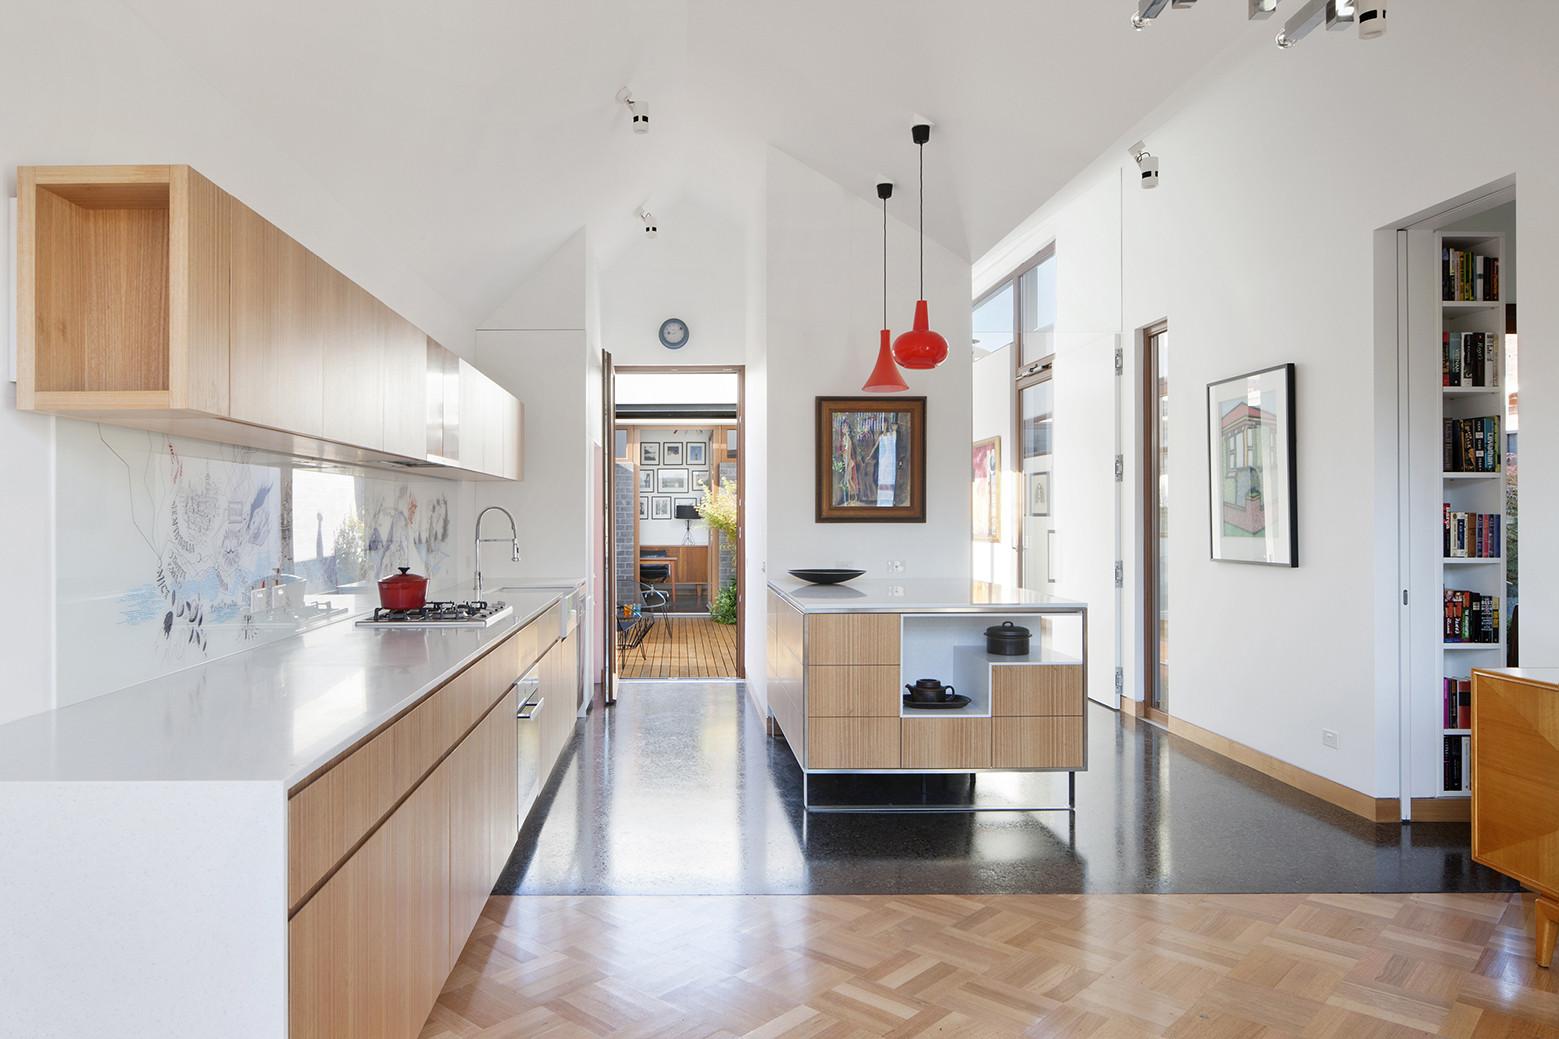 House in House / Steffen Welsch rchitects rchDaily - ^